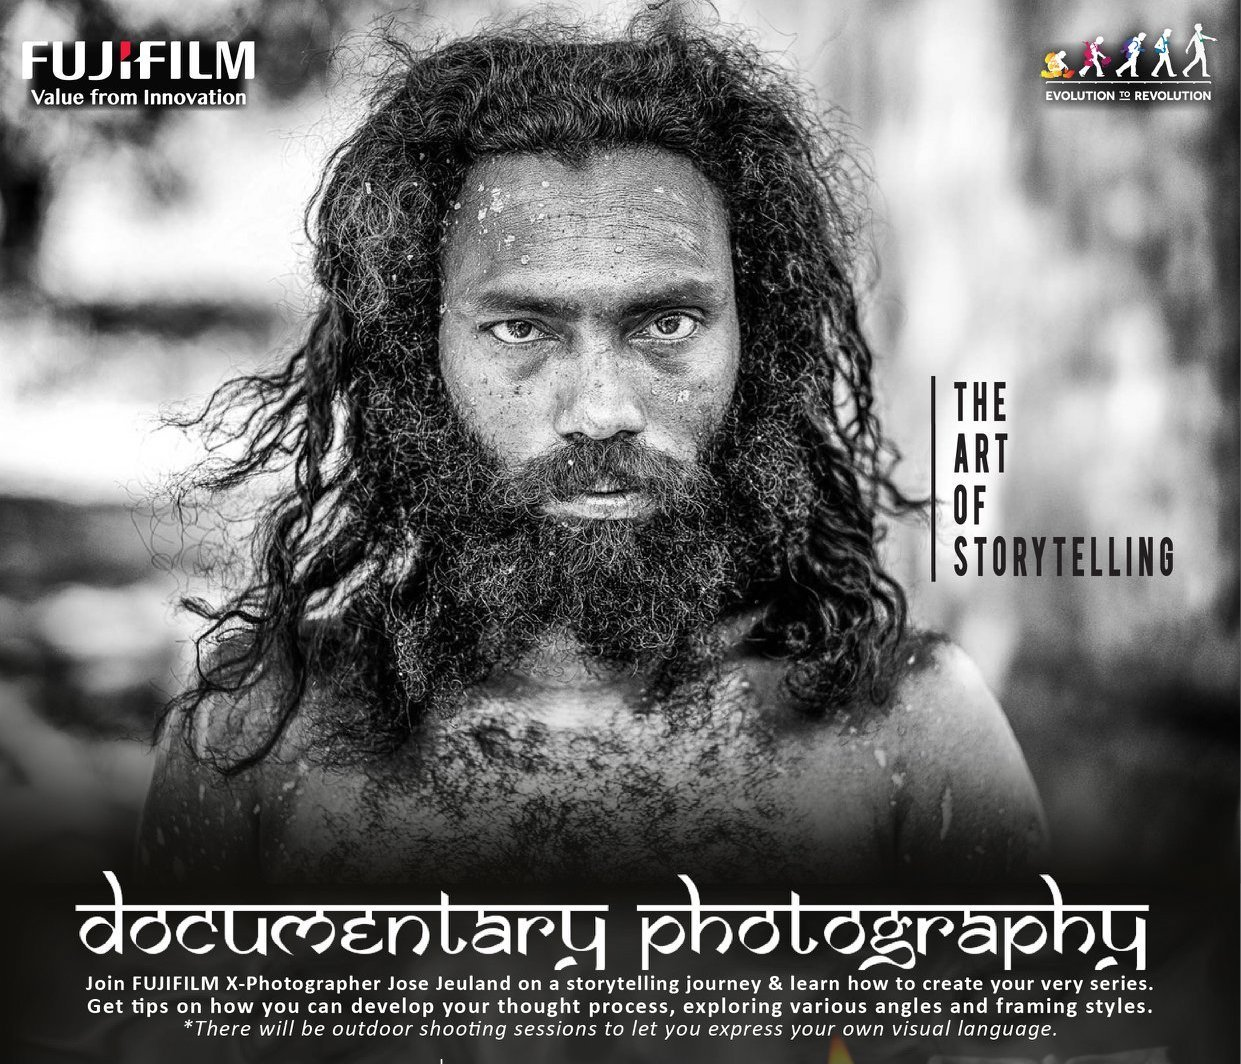 Documentary Photography Workshop with FUJIFILM Singapore